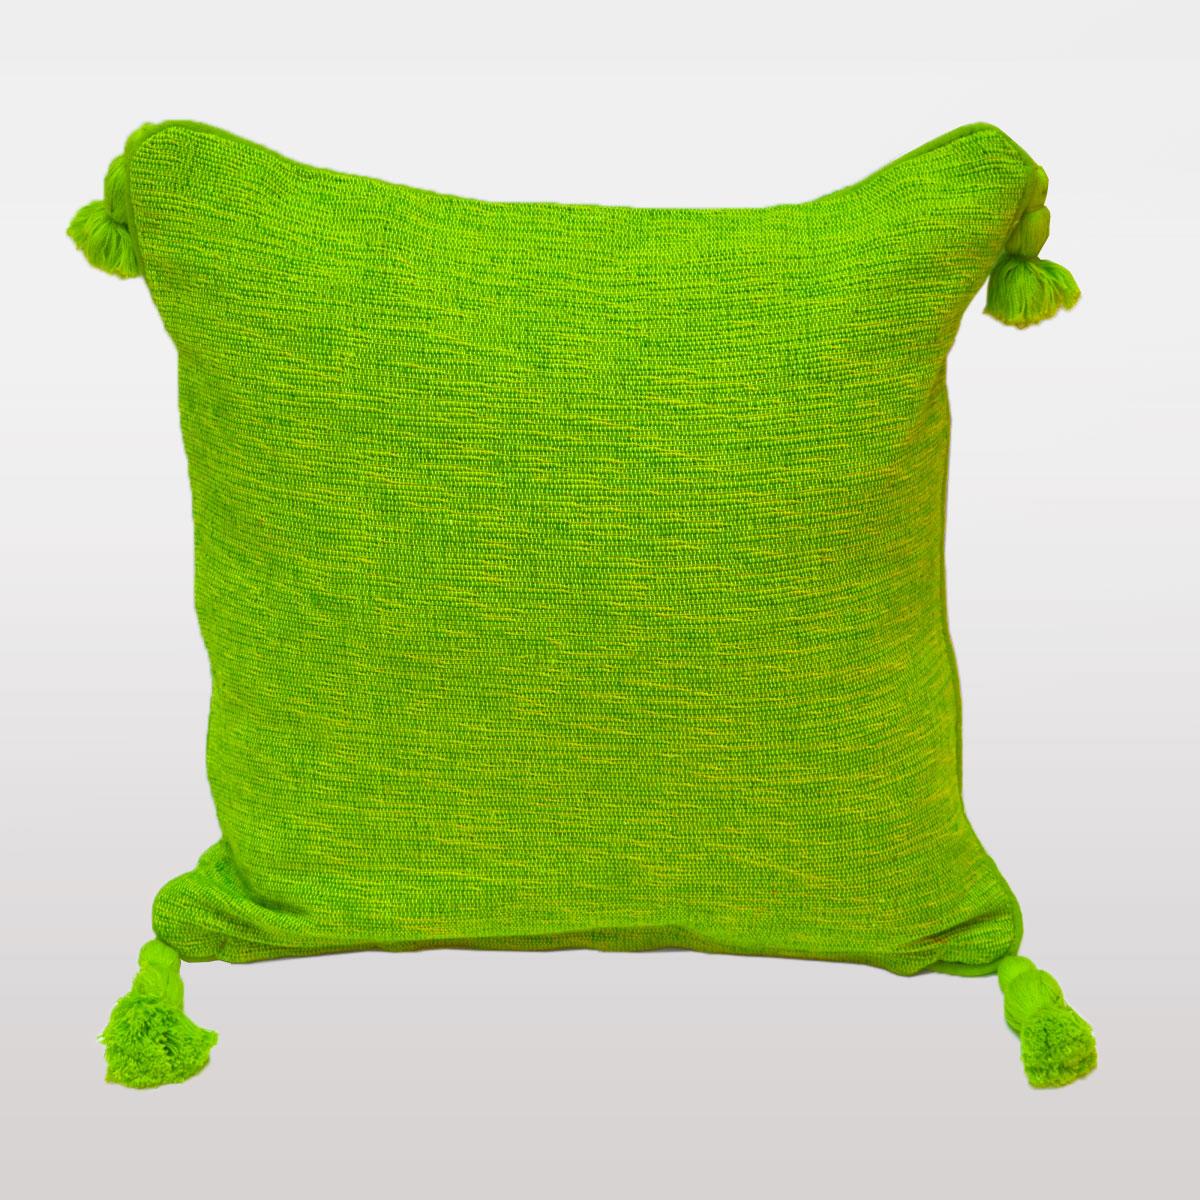 Jastučnica Tie&Dye